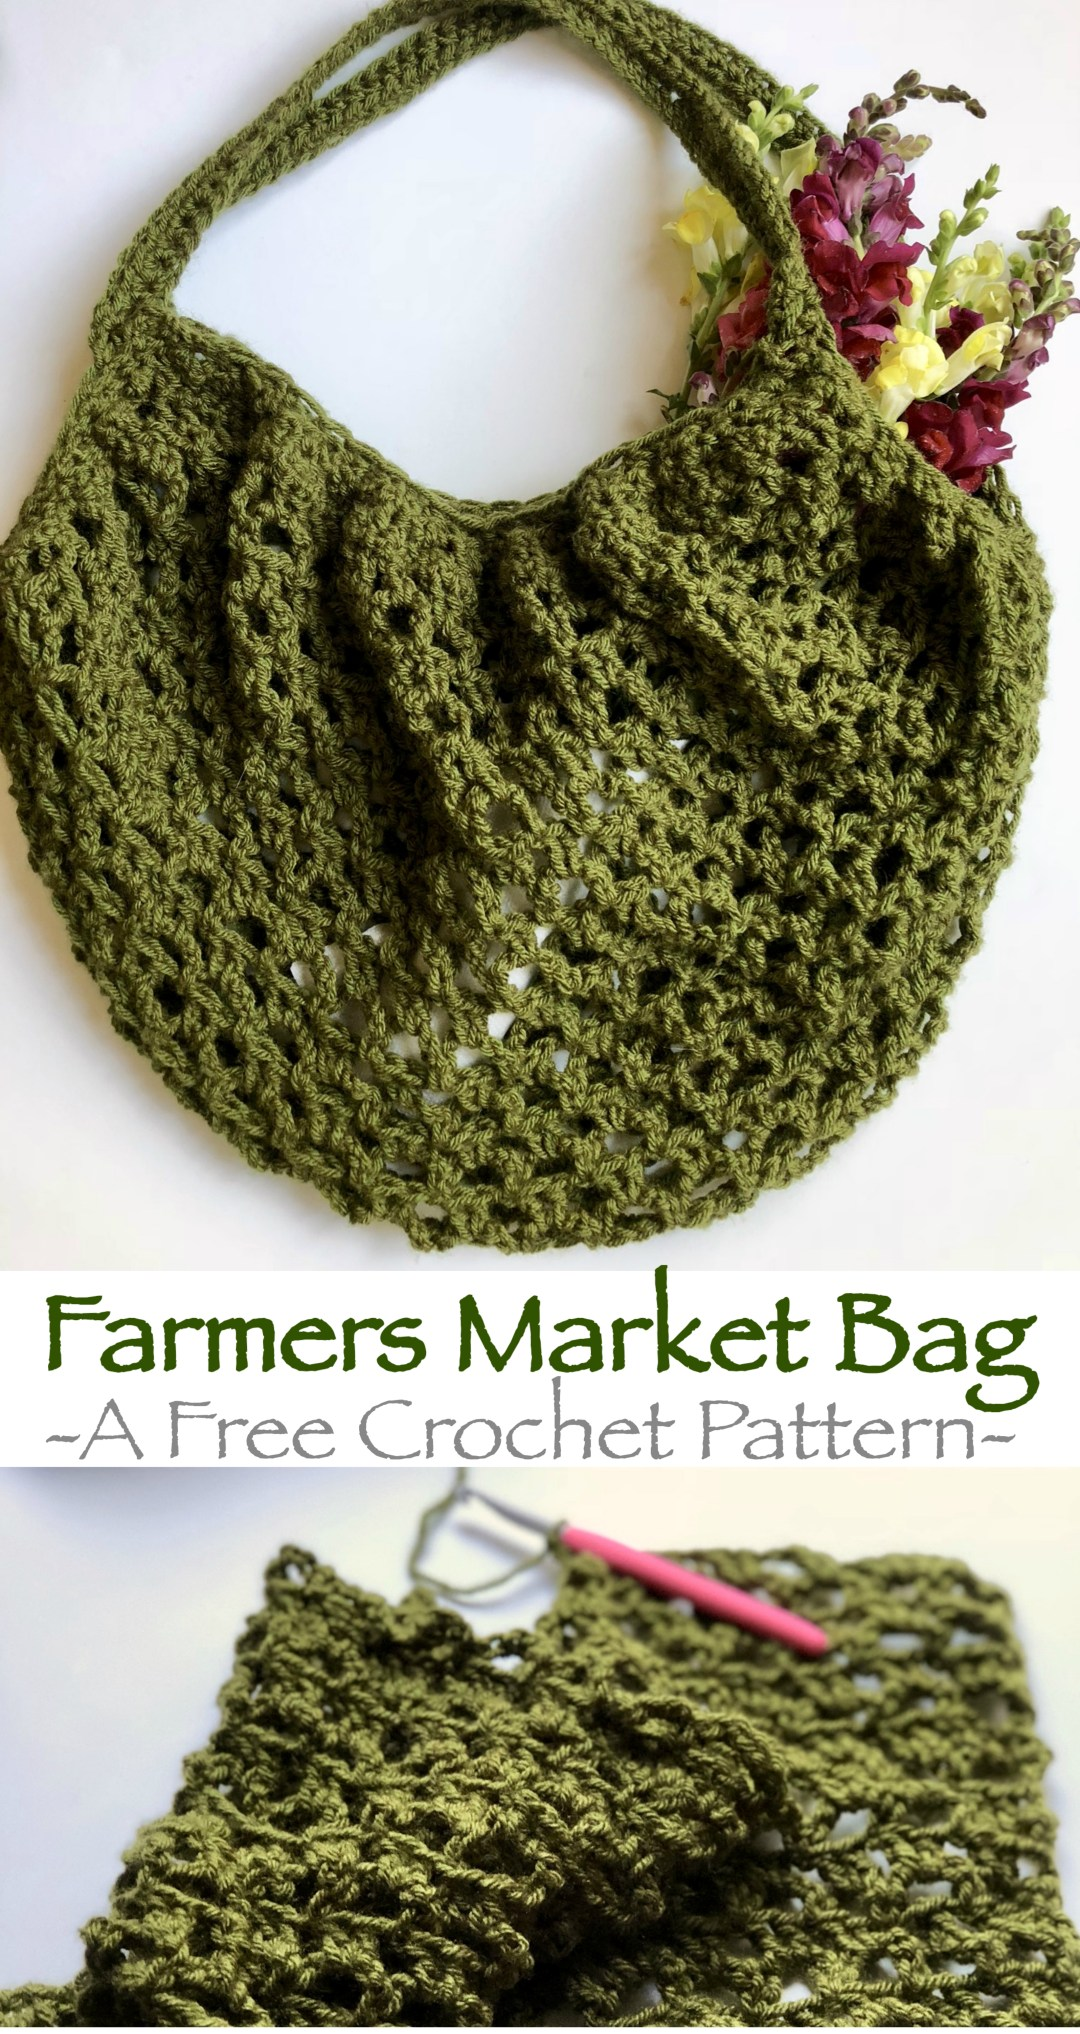 Farmer Market Bag.jpg